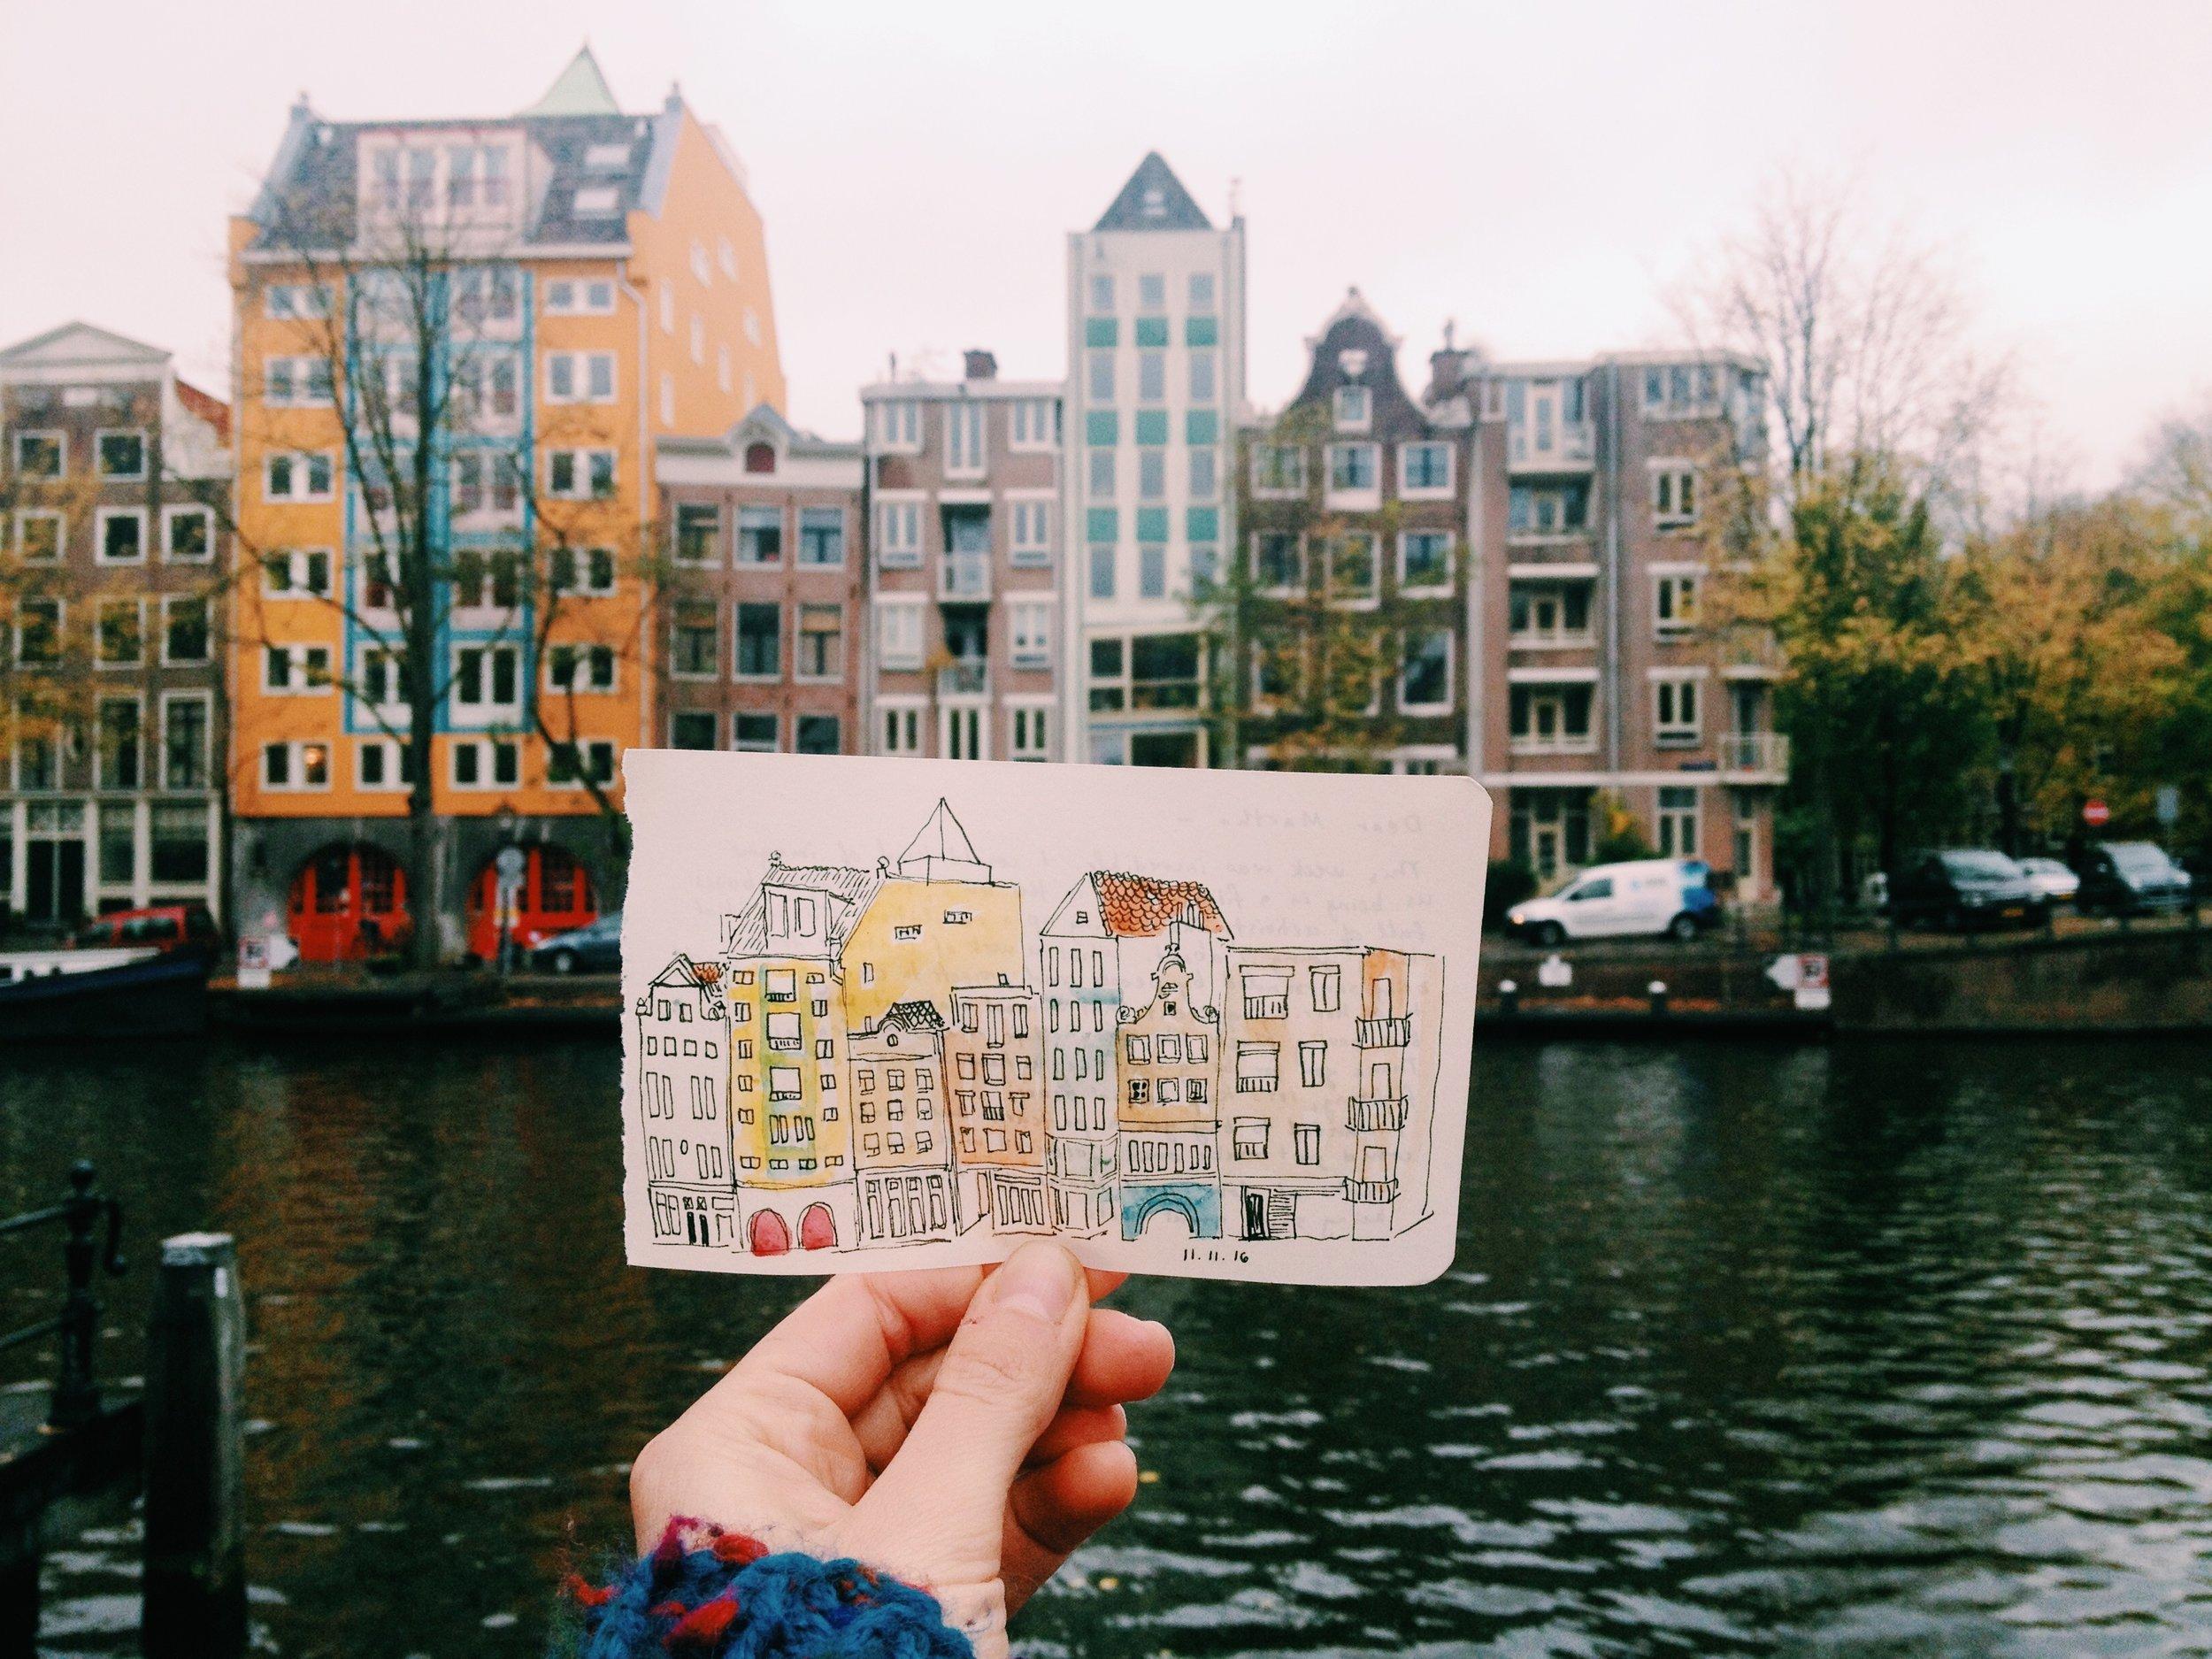 Amsterdam, NL | Martha | November 2016